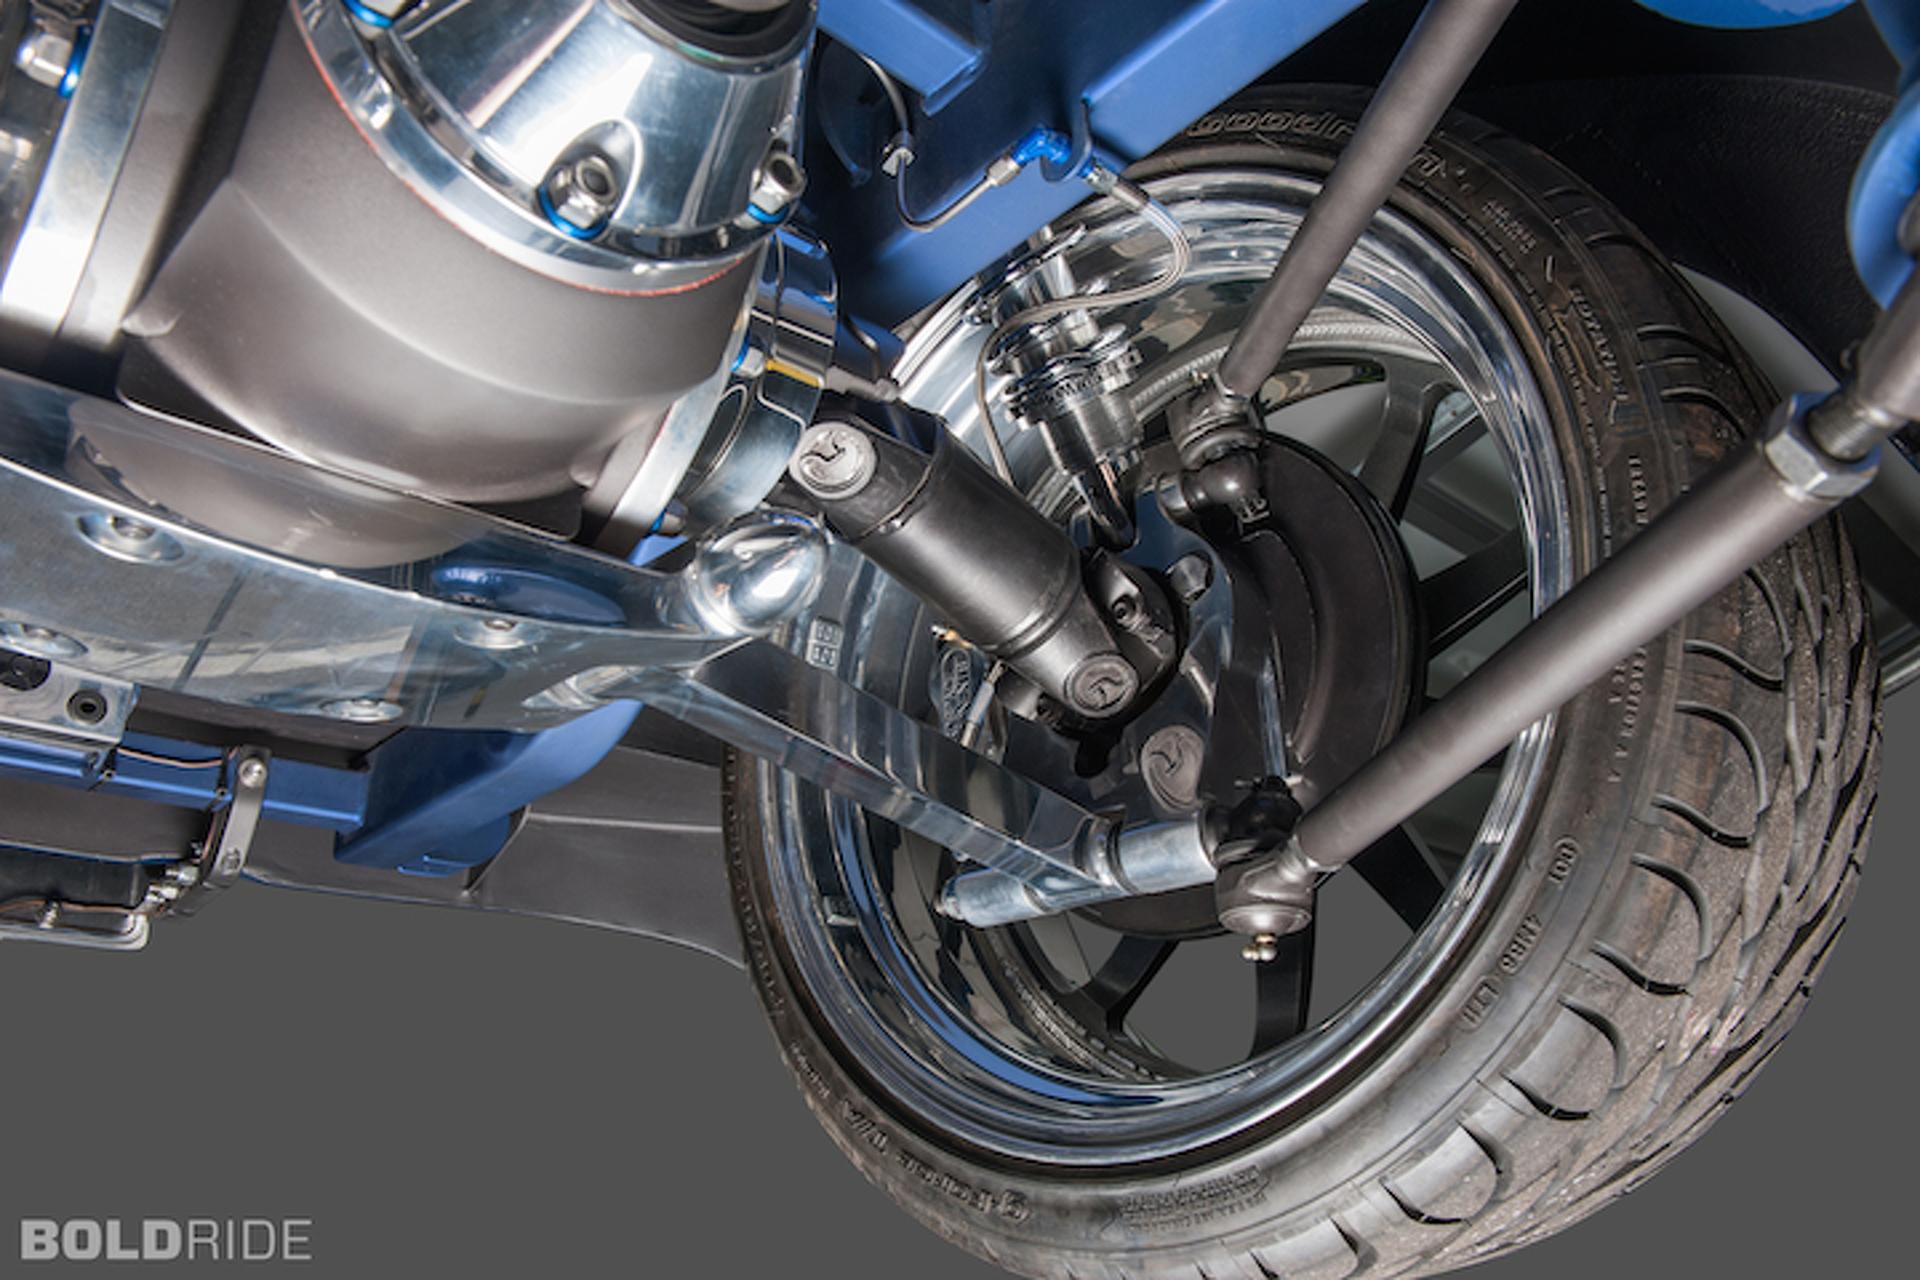 Stunning 650HP Viper-Powered Karmann Ghia Custom: Your Ride